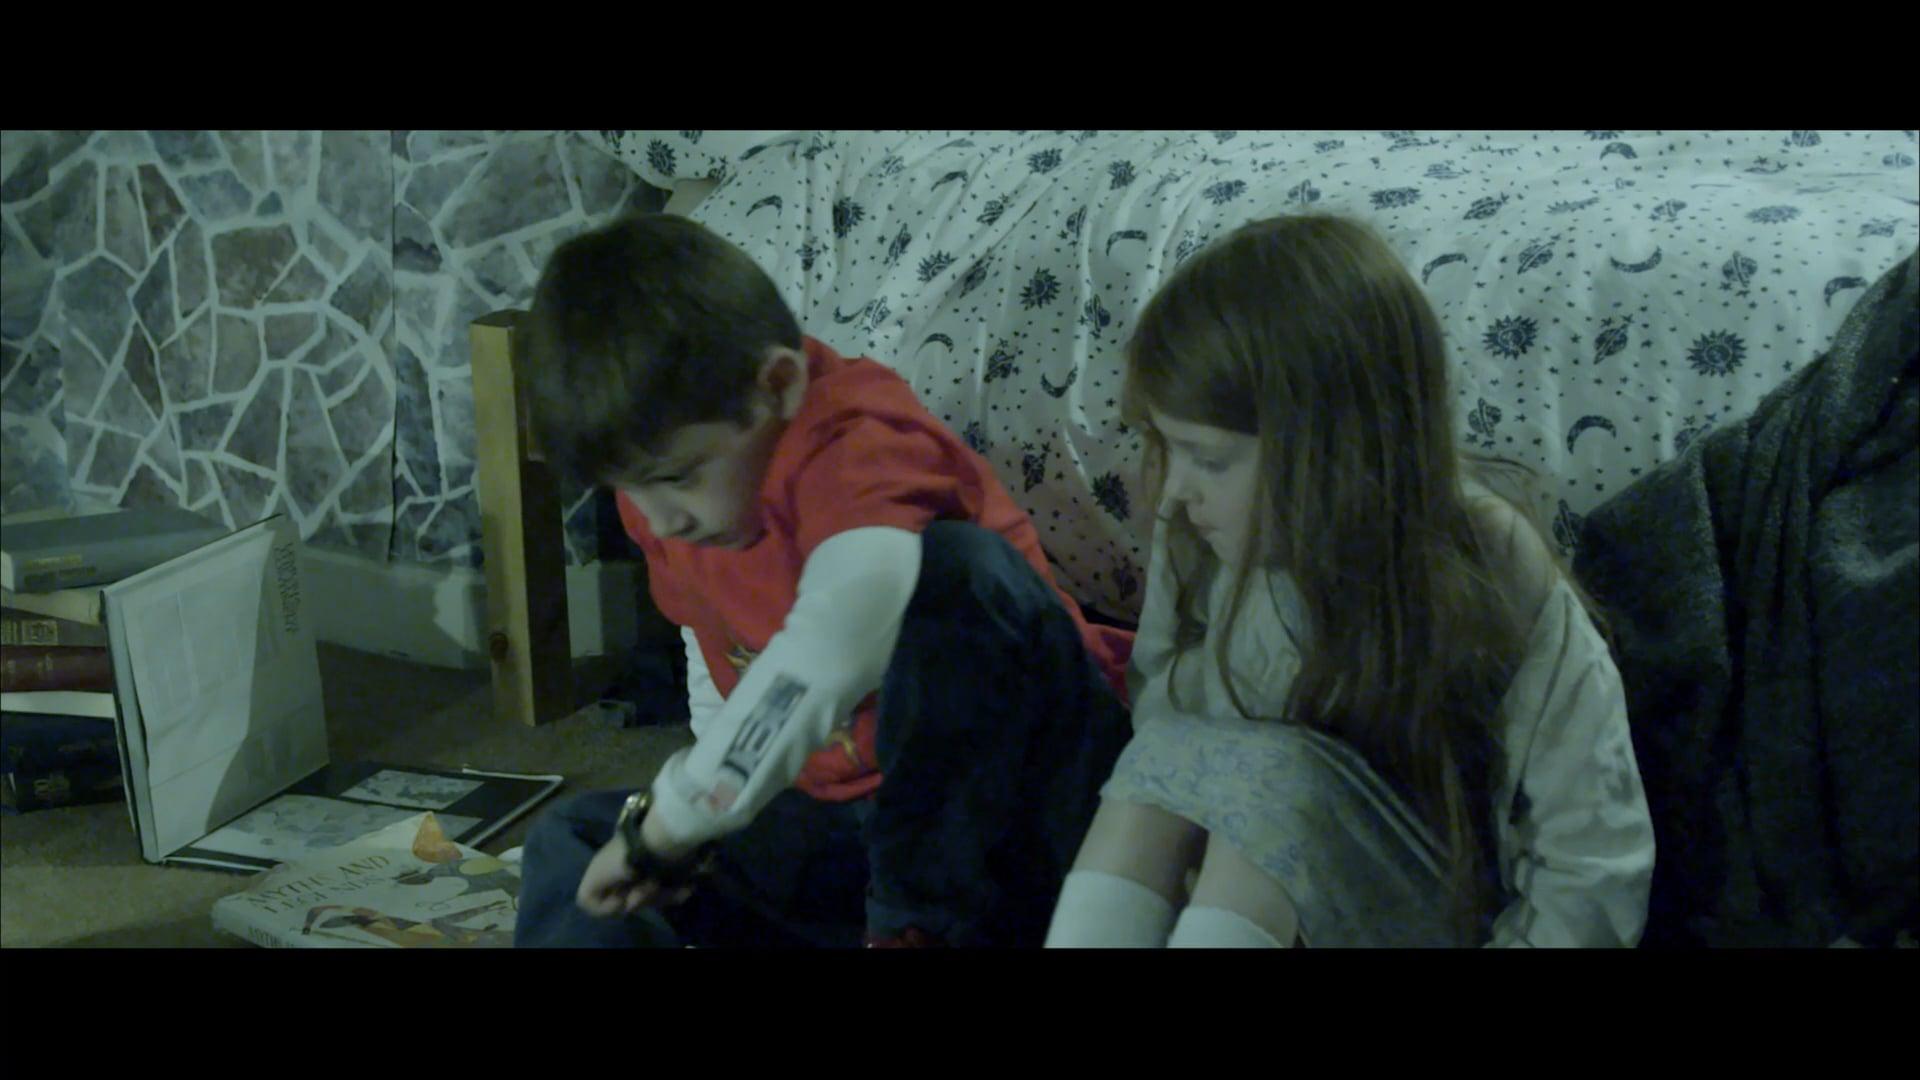 Lemuria for Vimeo